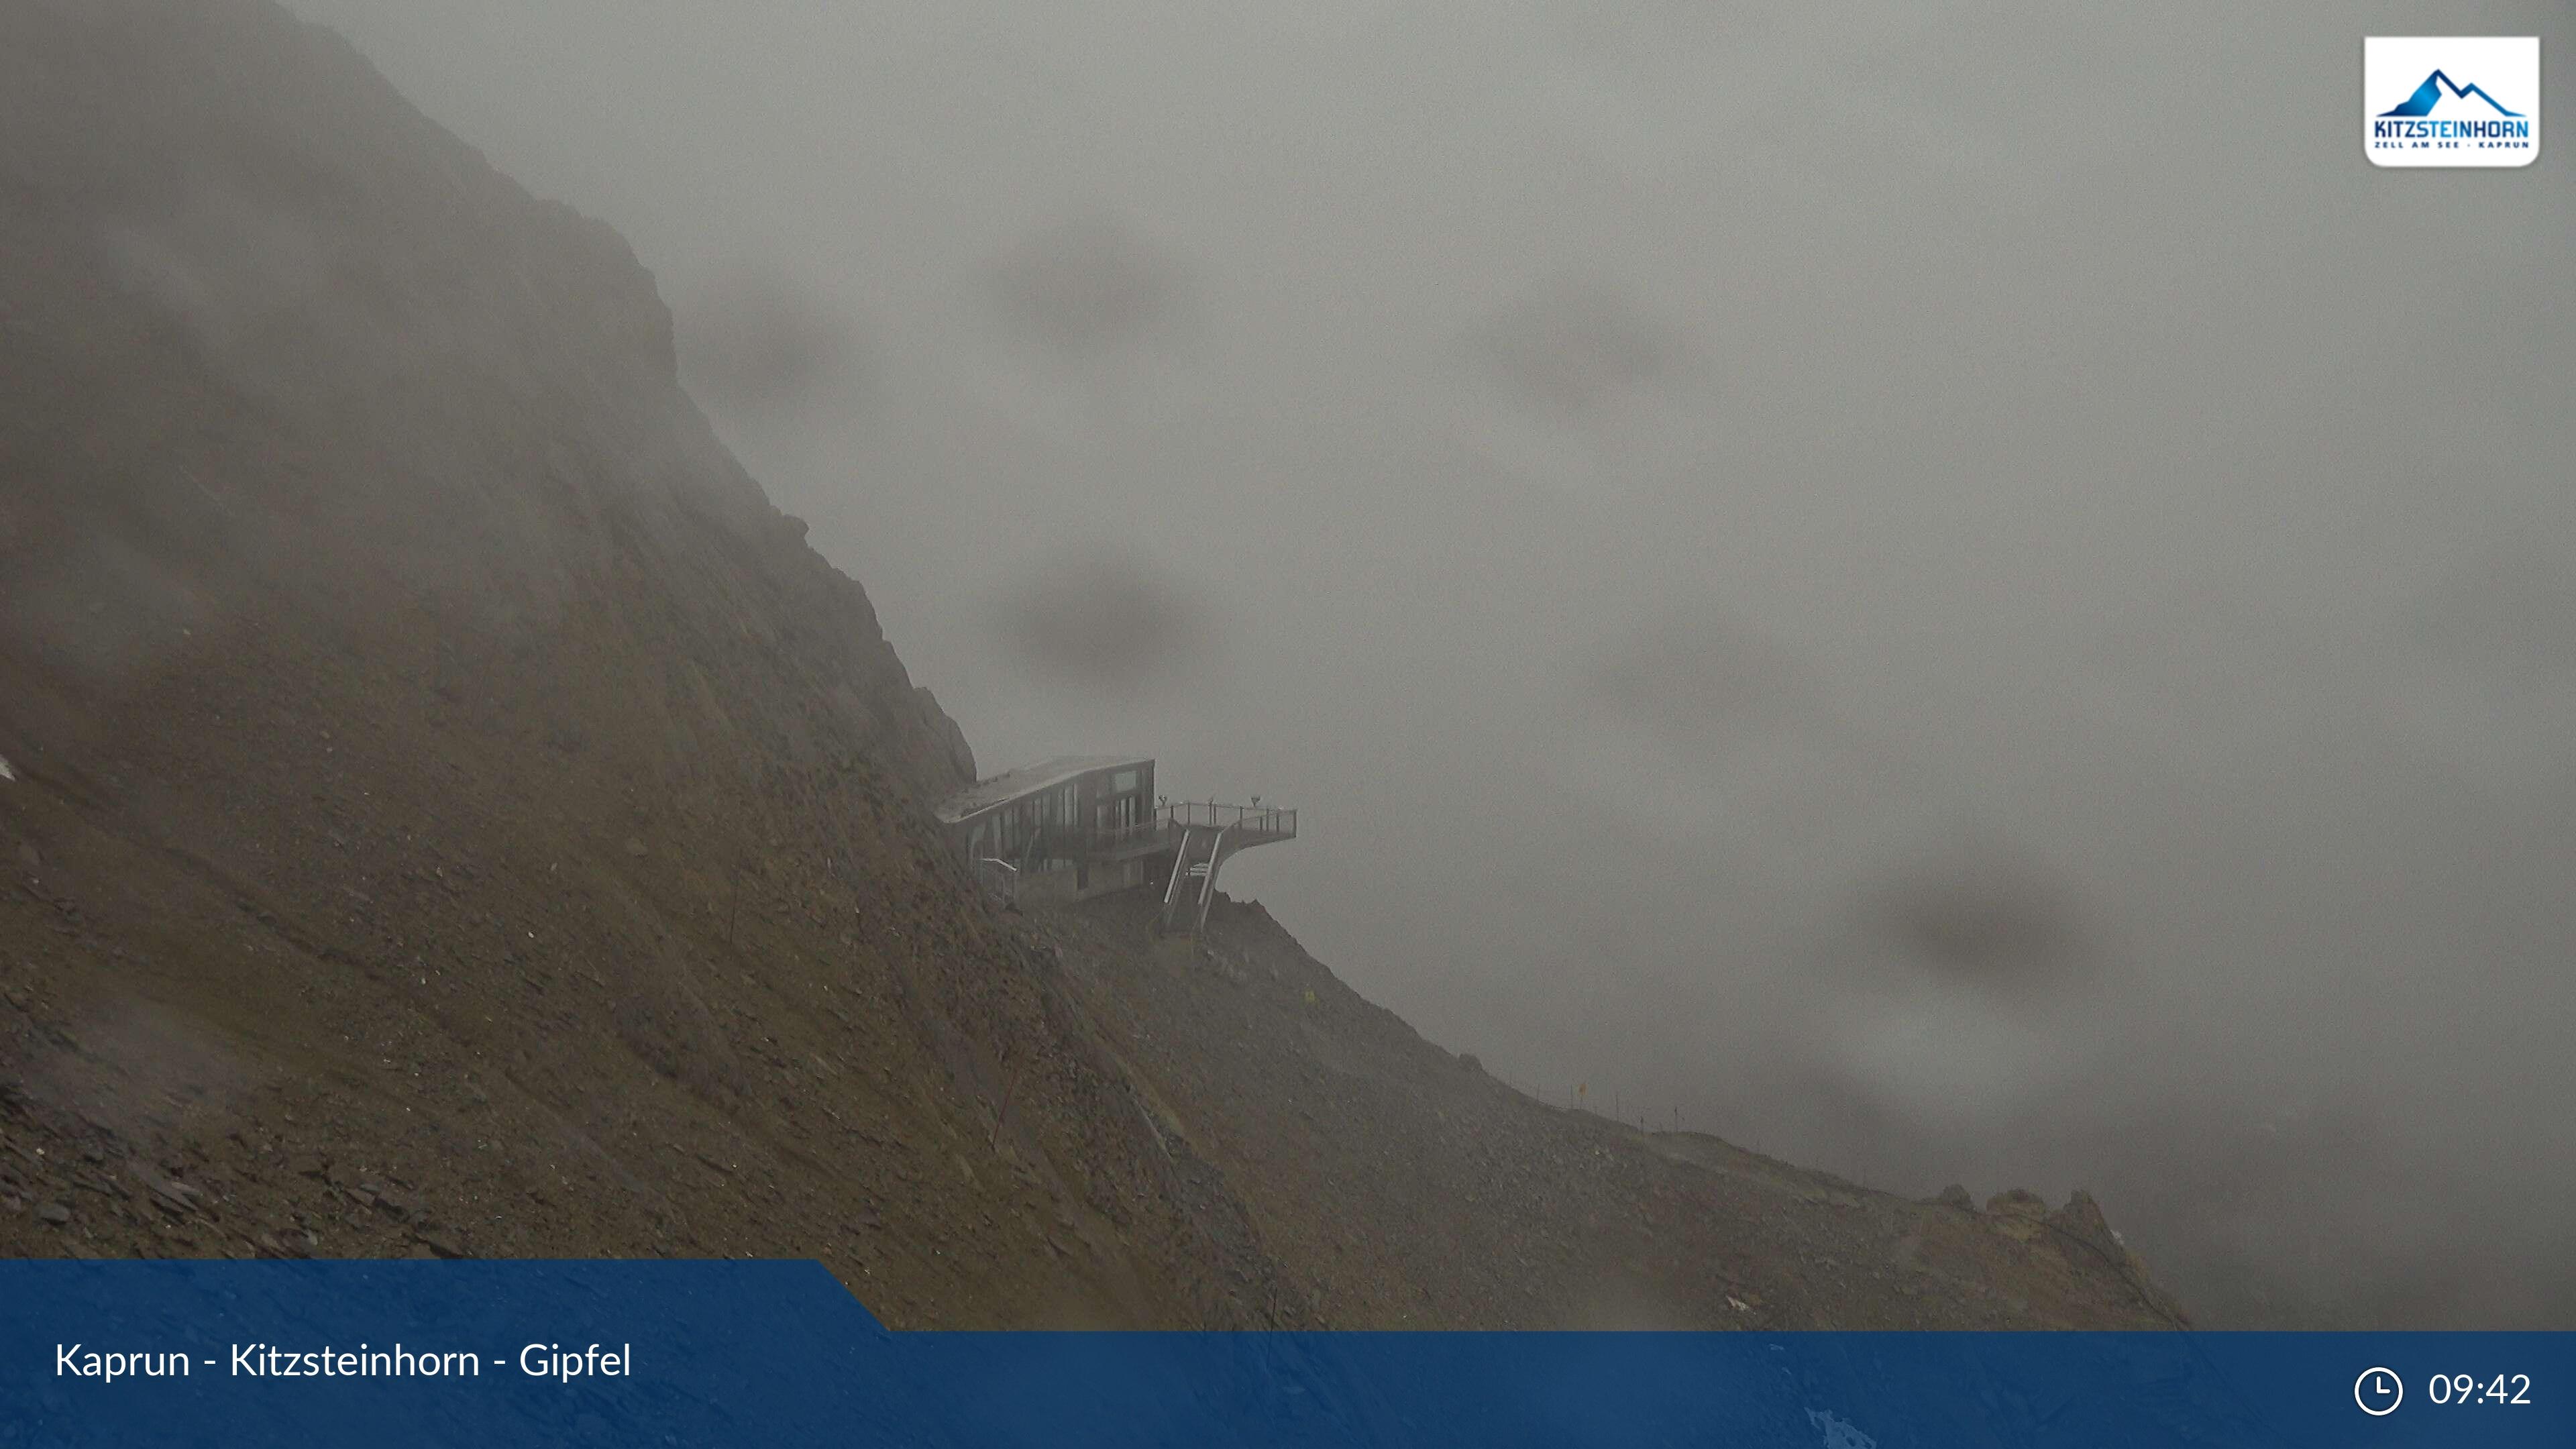 Kitzsteinhorn - Gipfel